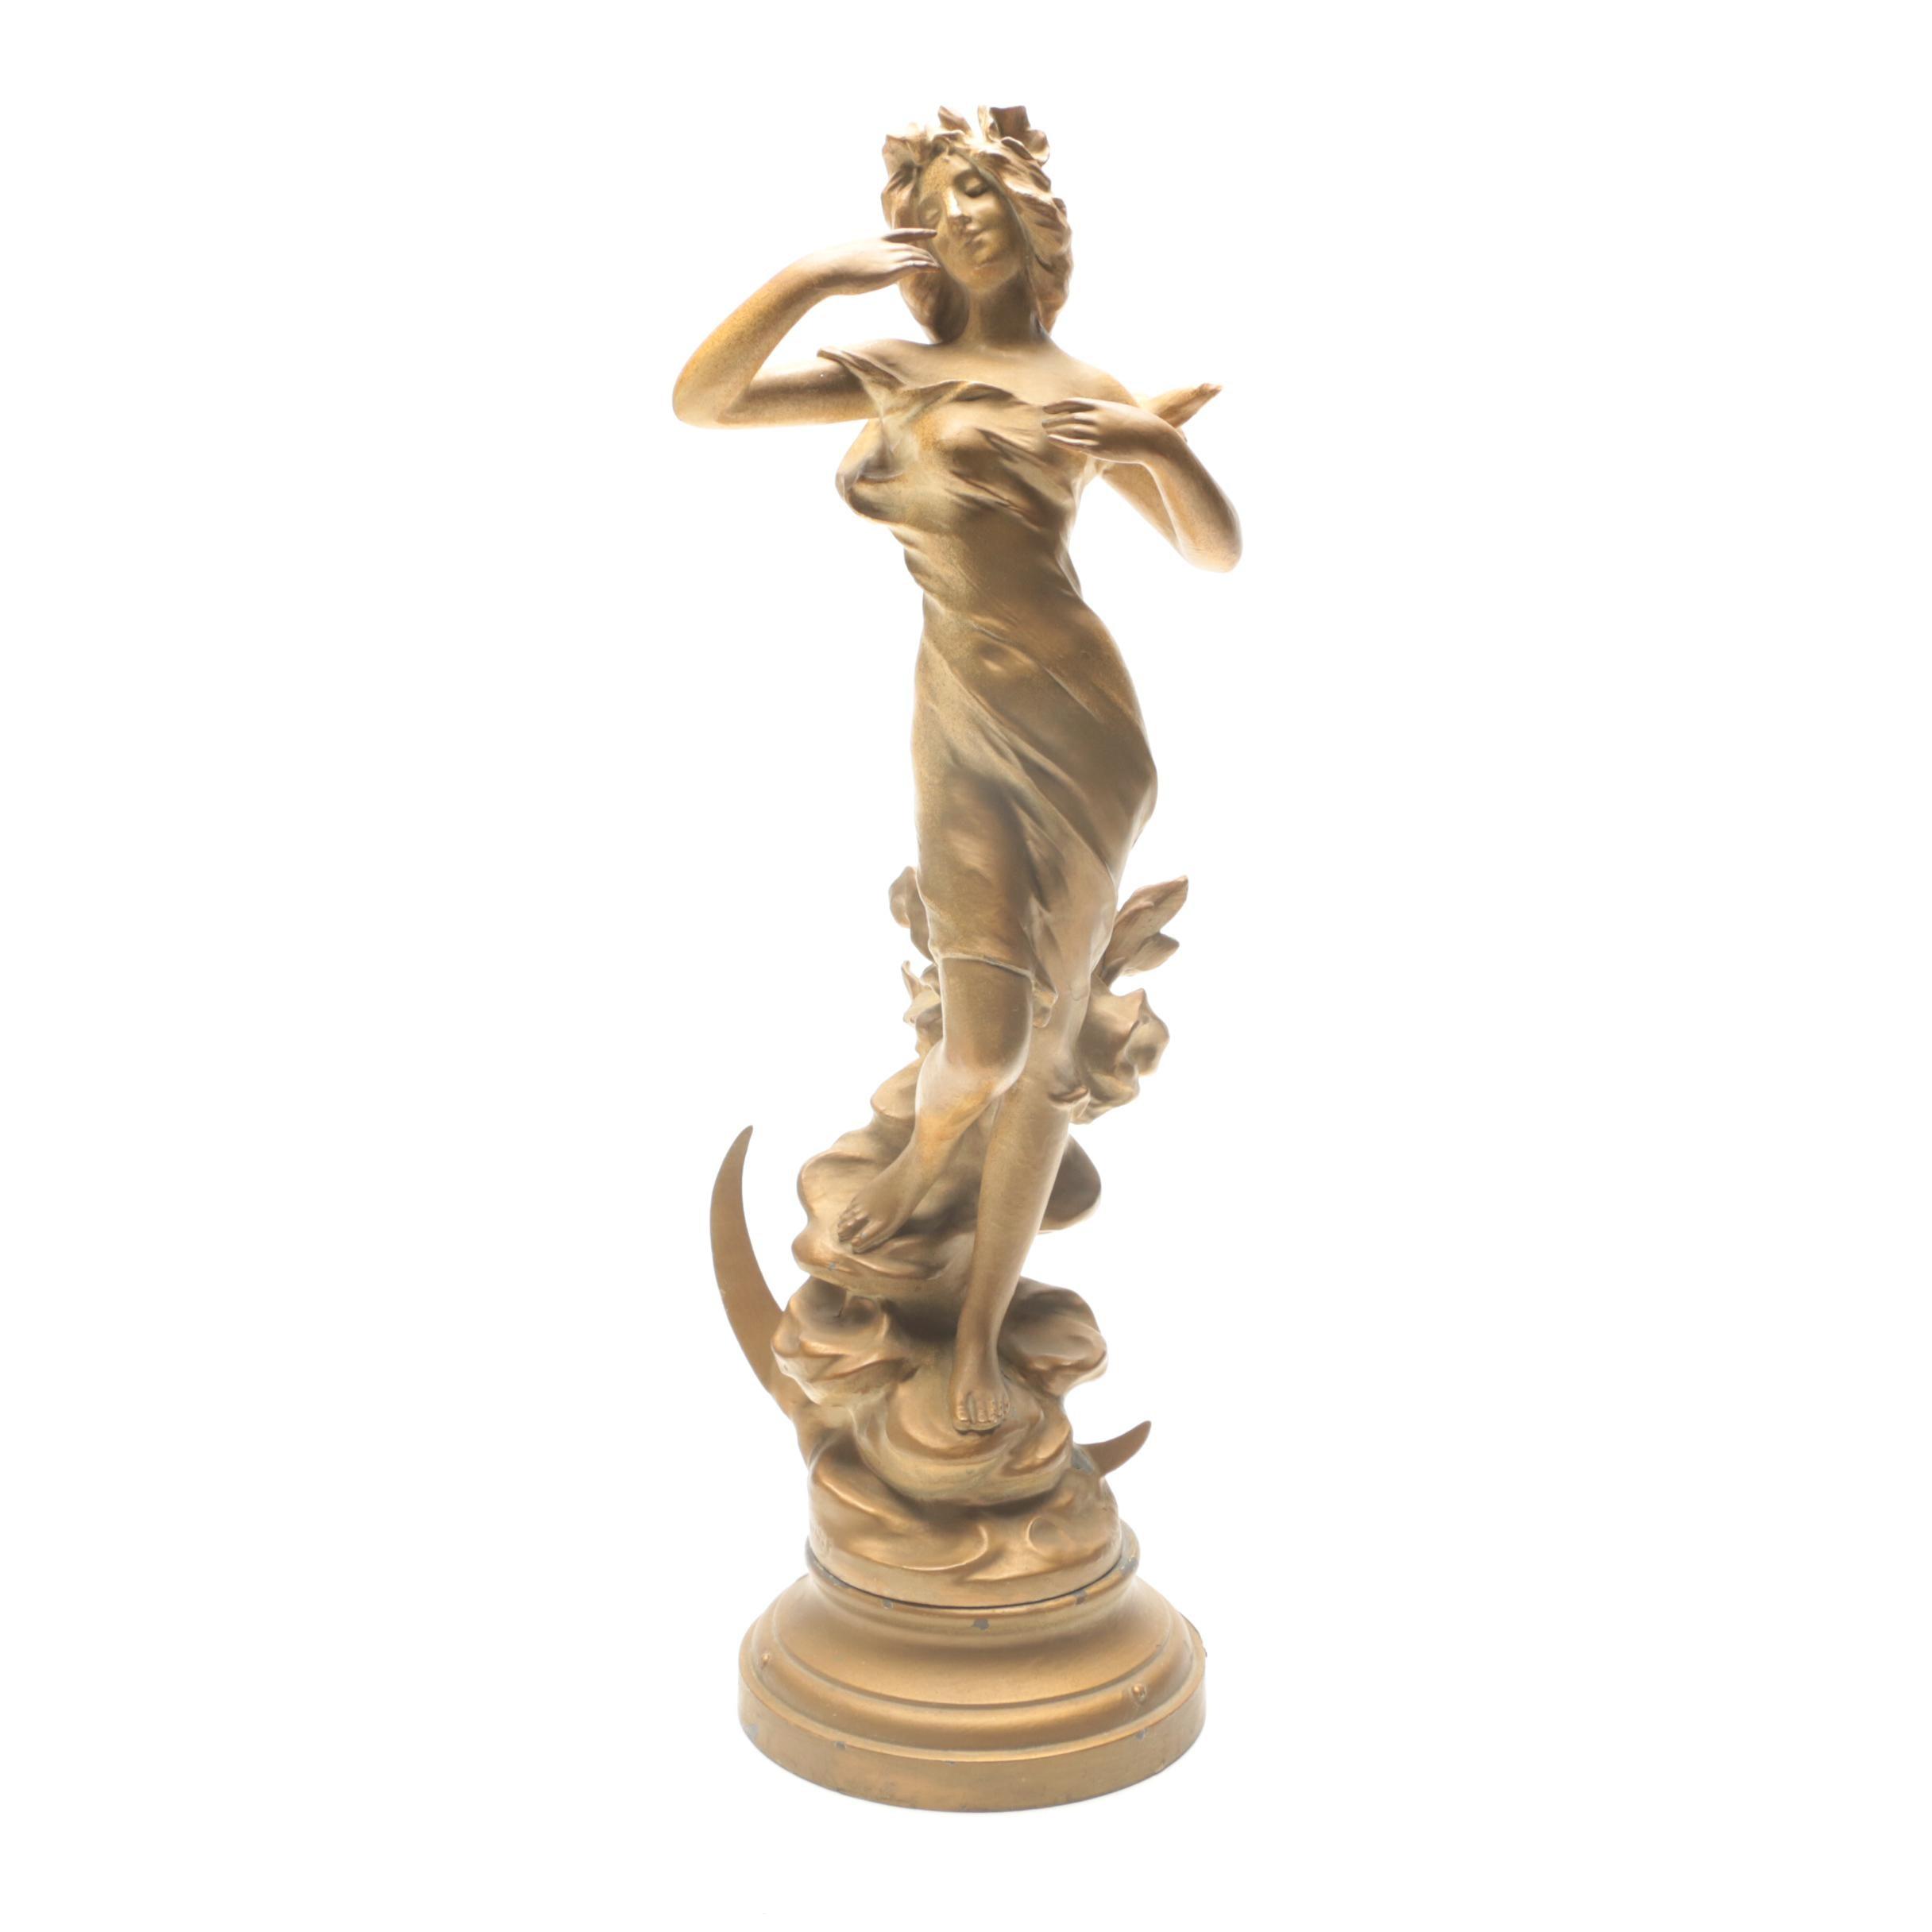 Signed Art Nouveau Recast Statue After Julian Causse Sculpture